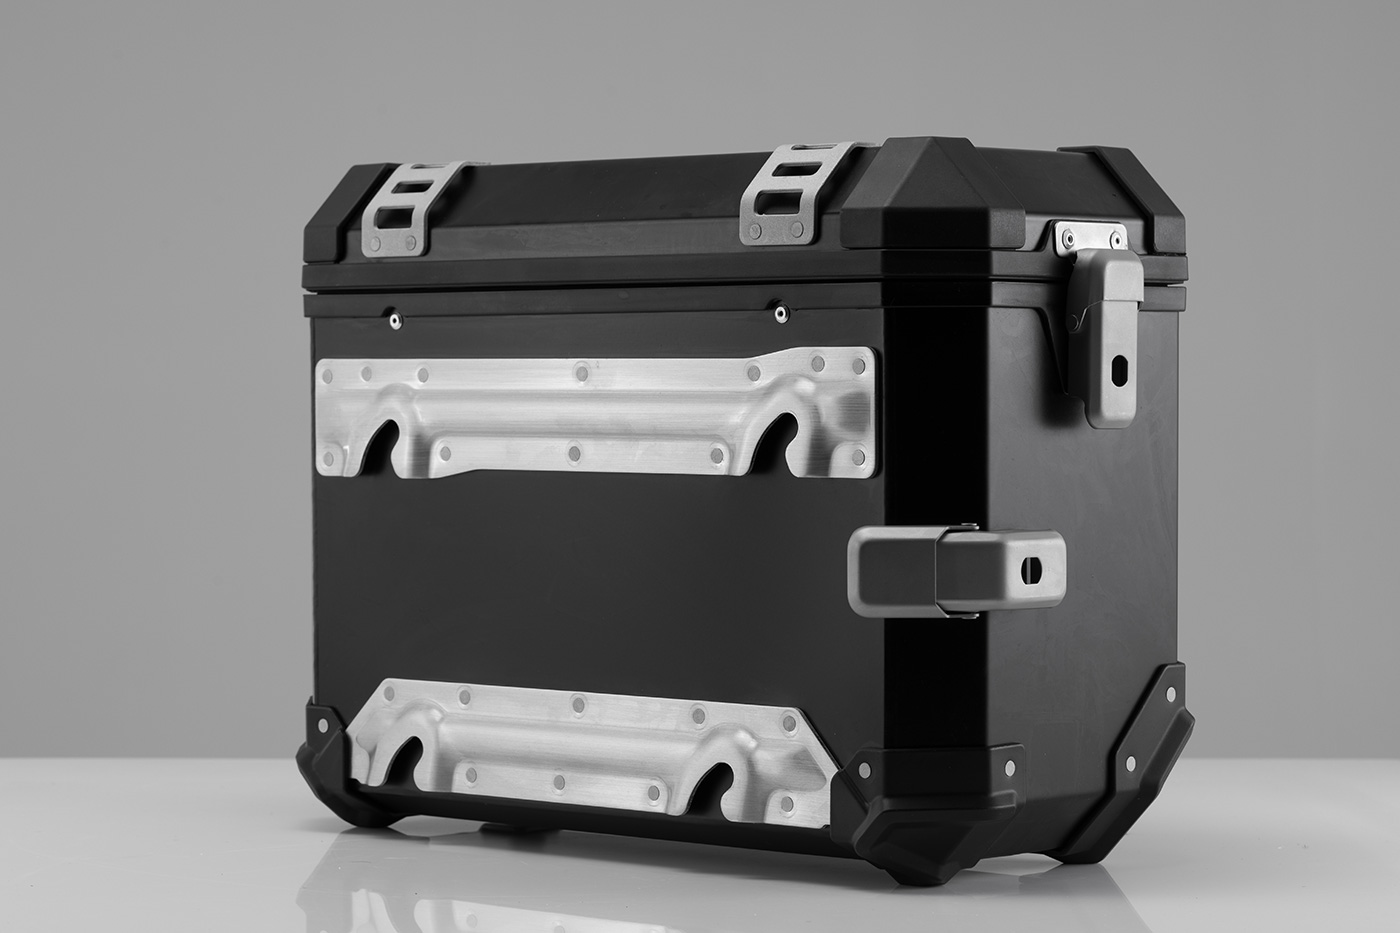 SW-Motech TRAX-ION aluminium-case